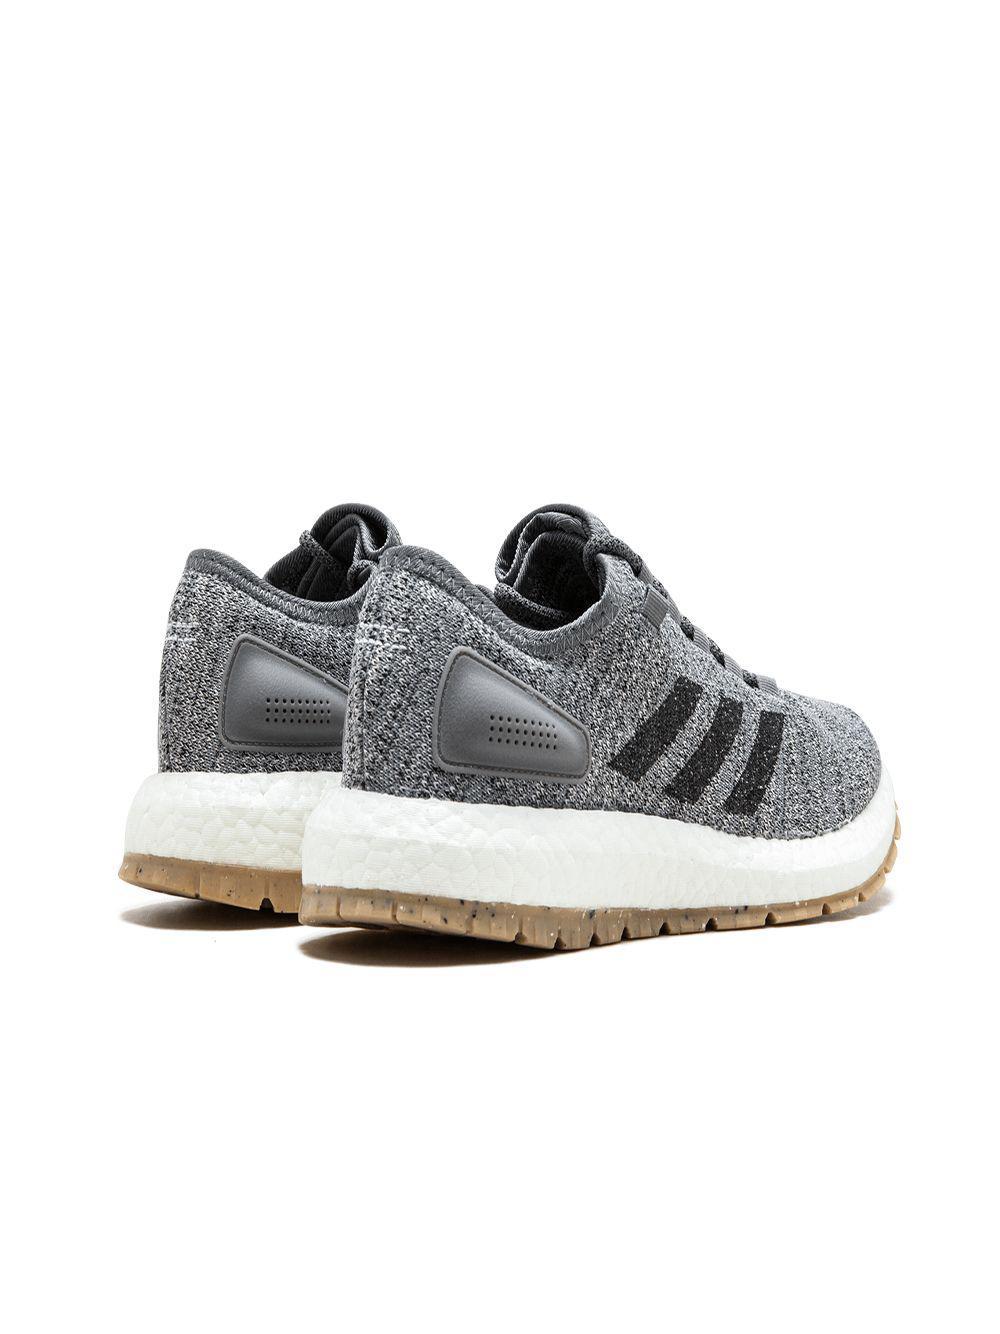 bb4a21edbbc adidas Pureboost All Terrain Sneakers in Gray for Men - Lyst